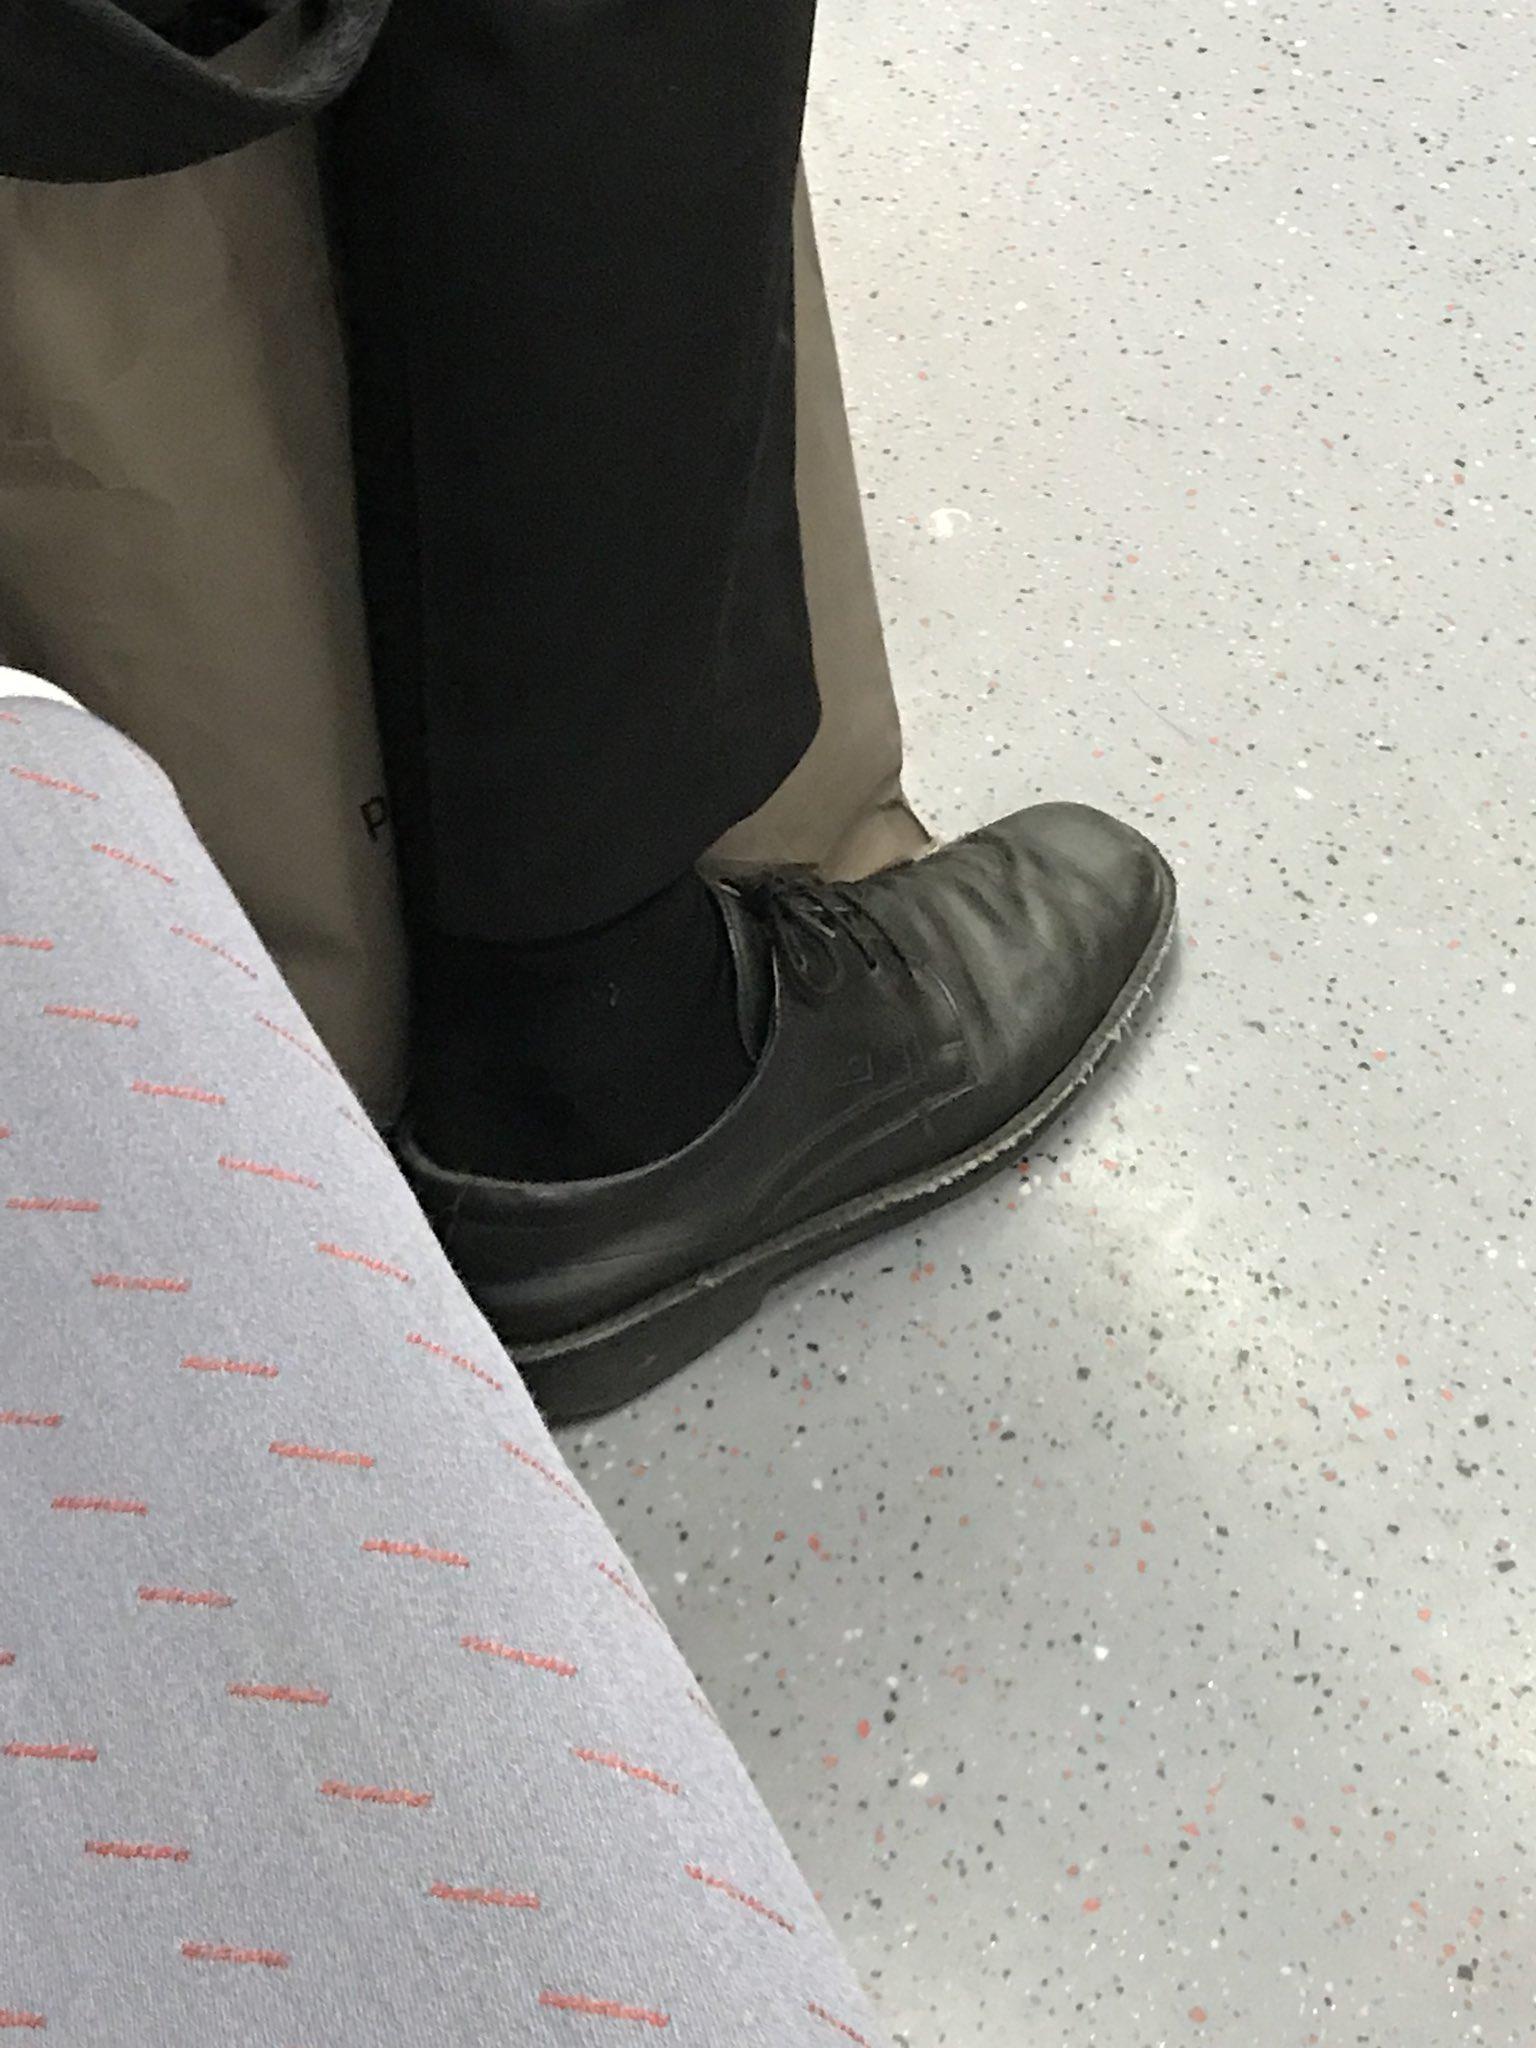 Porn and socks socksandporn twitter